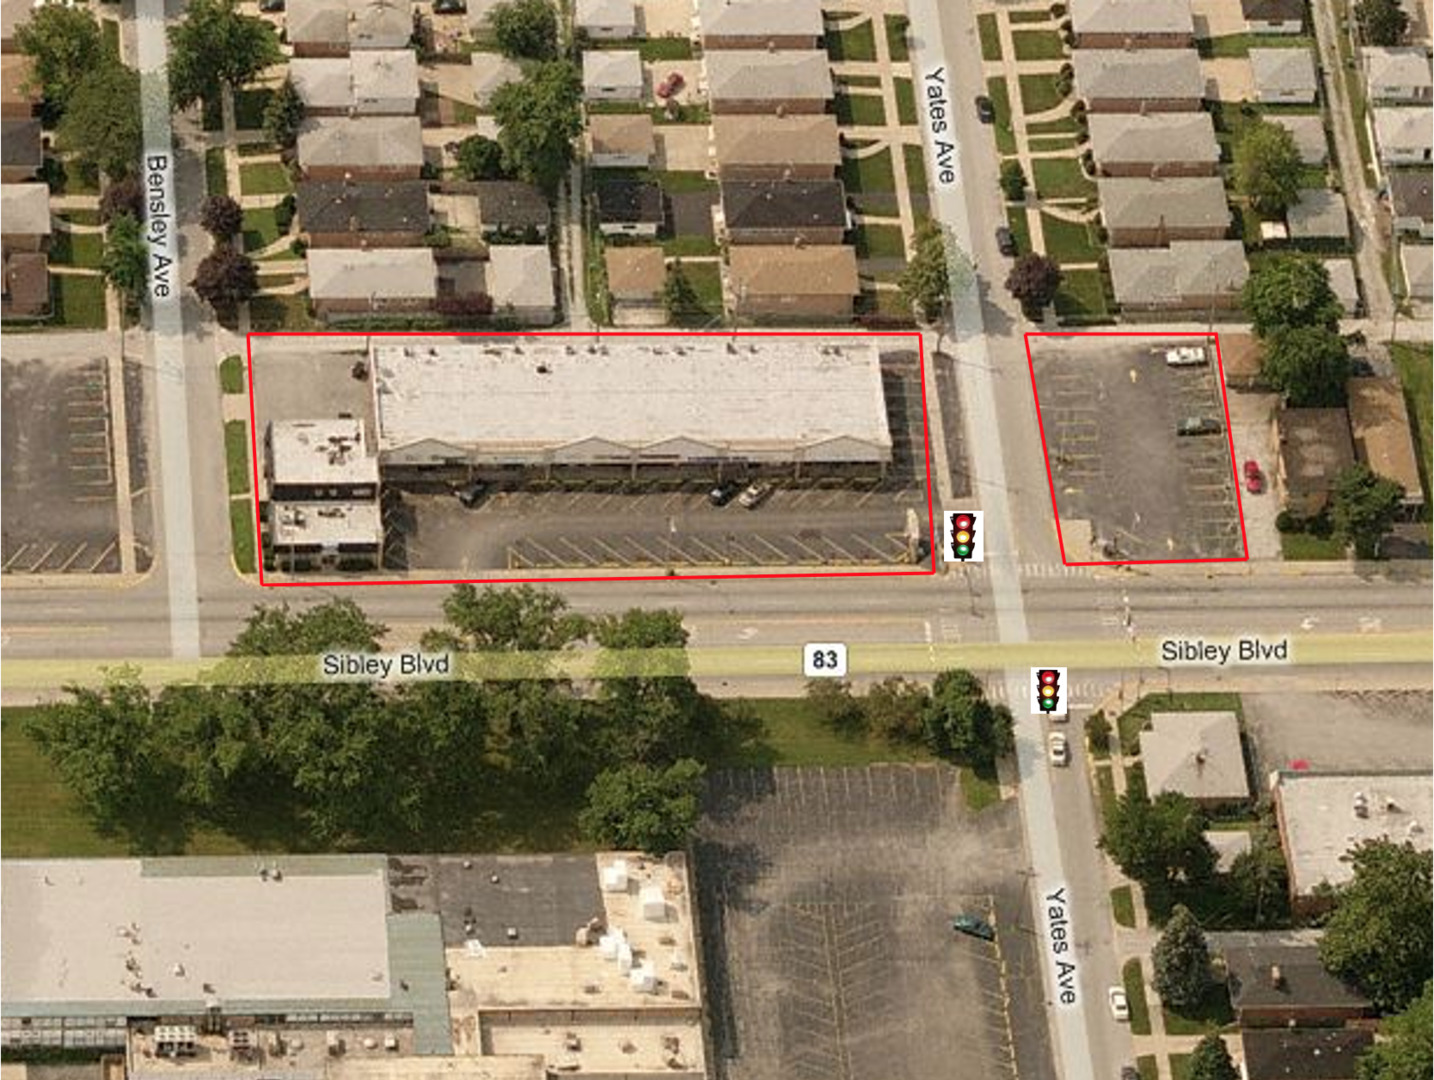 1555 Sibley ,Calumet City, Illinois 60409